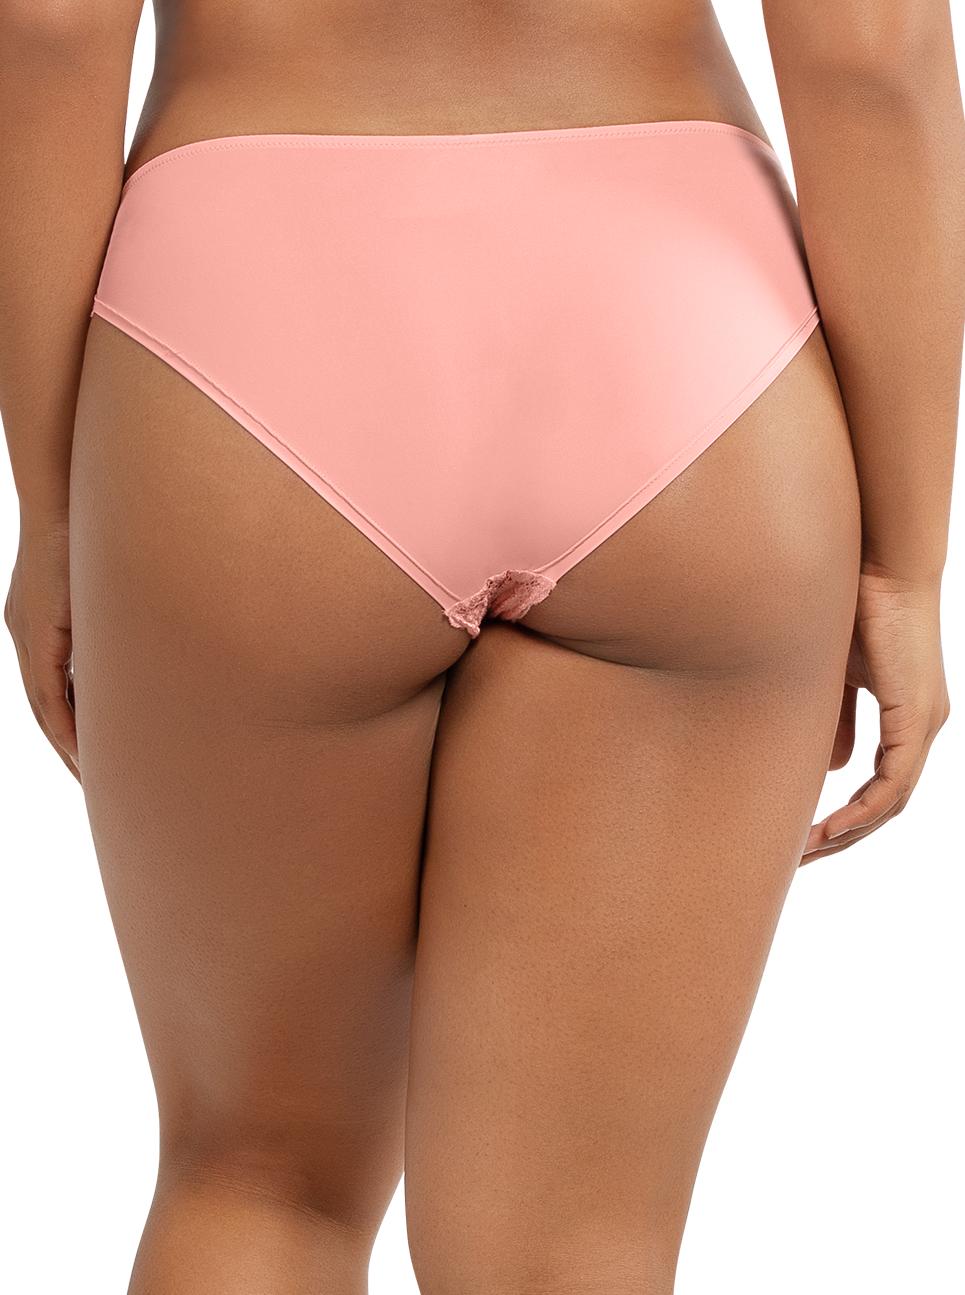 PARFAIT Adriana BikiniP5483 PeachBud Back - Adriana Bikini - Peach Bud - P5483